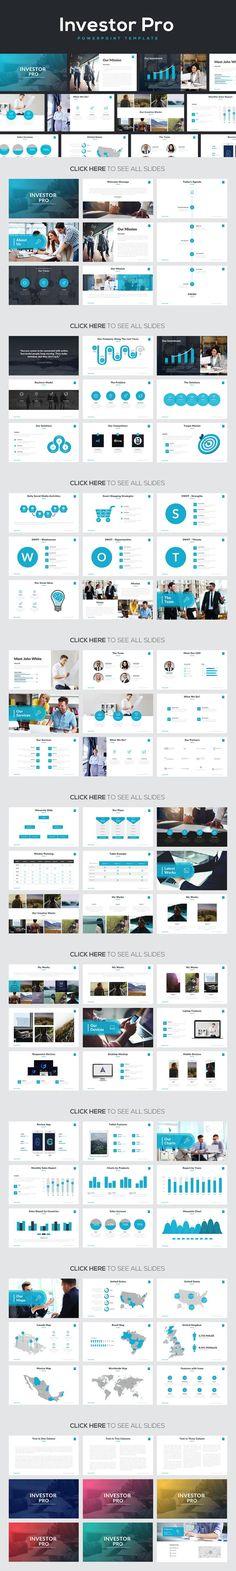 #presentation #template from Rocketo Graphics | DOWNLOAD: https://creativemarket.com/RocketoGraphics/727834-Investor-Pro-Powerpoint-Template?u=zsoltczigler